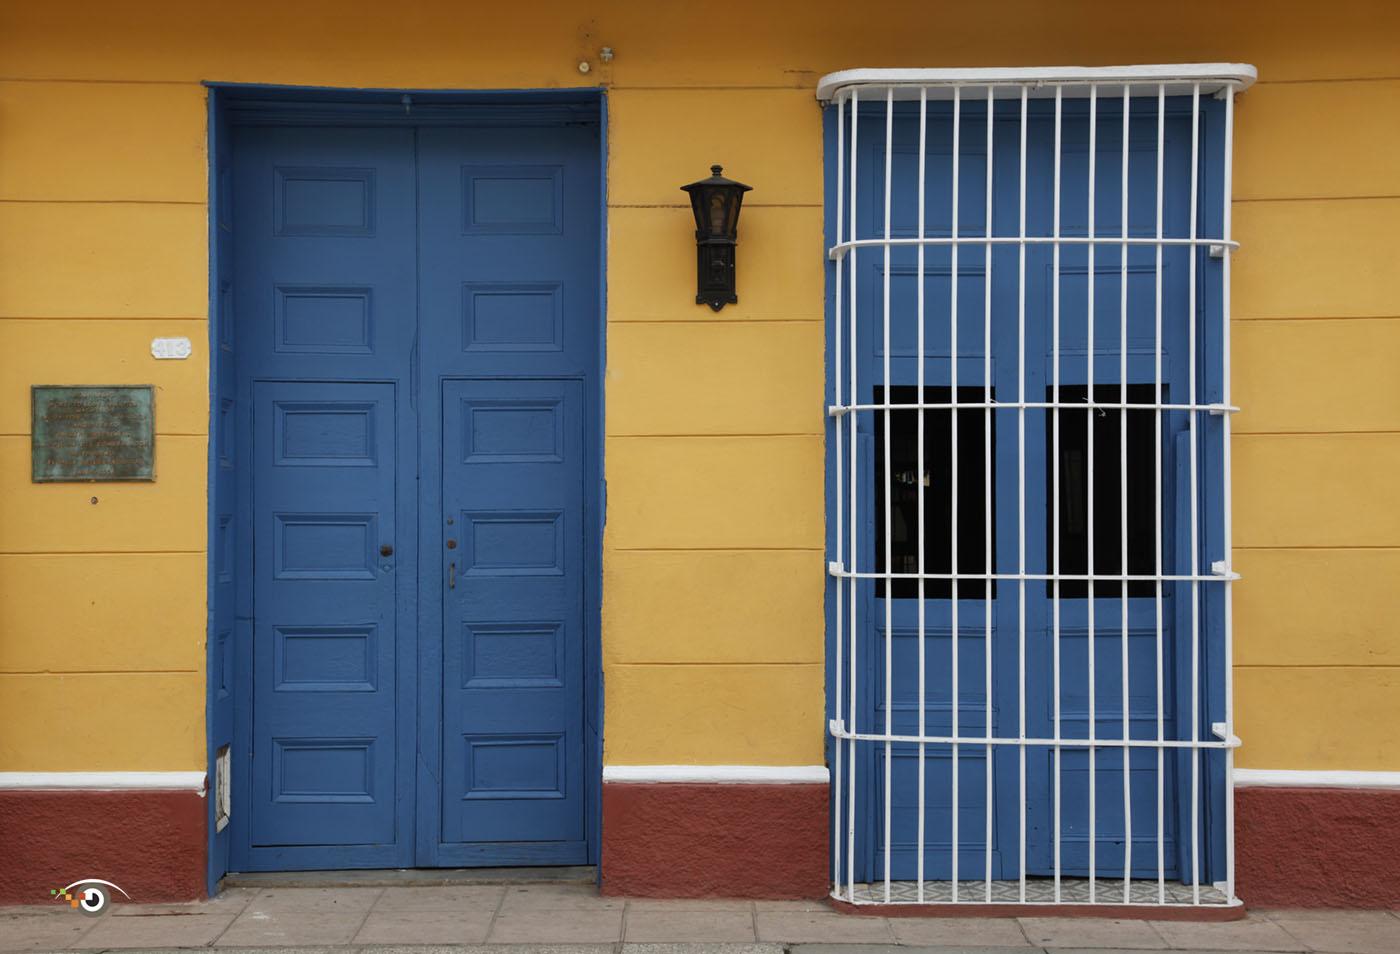 Cuba 7 Rick Sammon.jpg